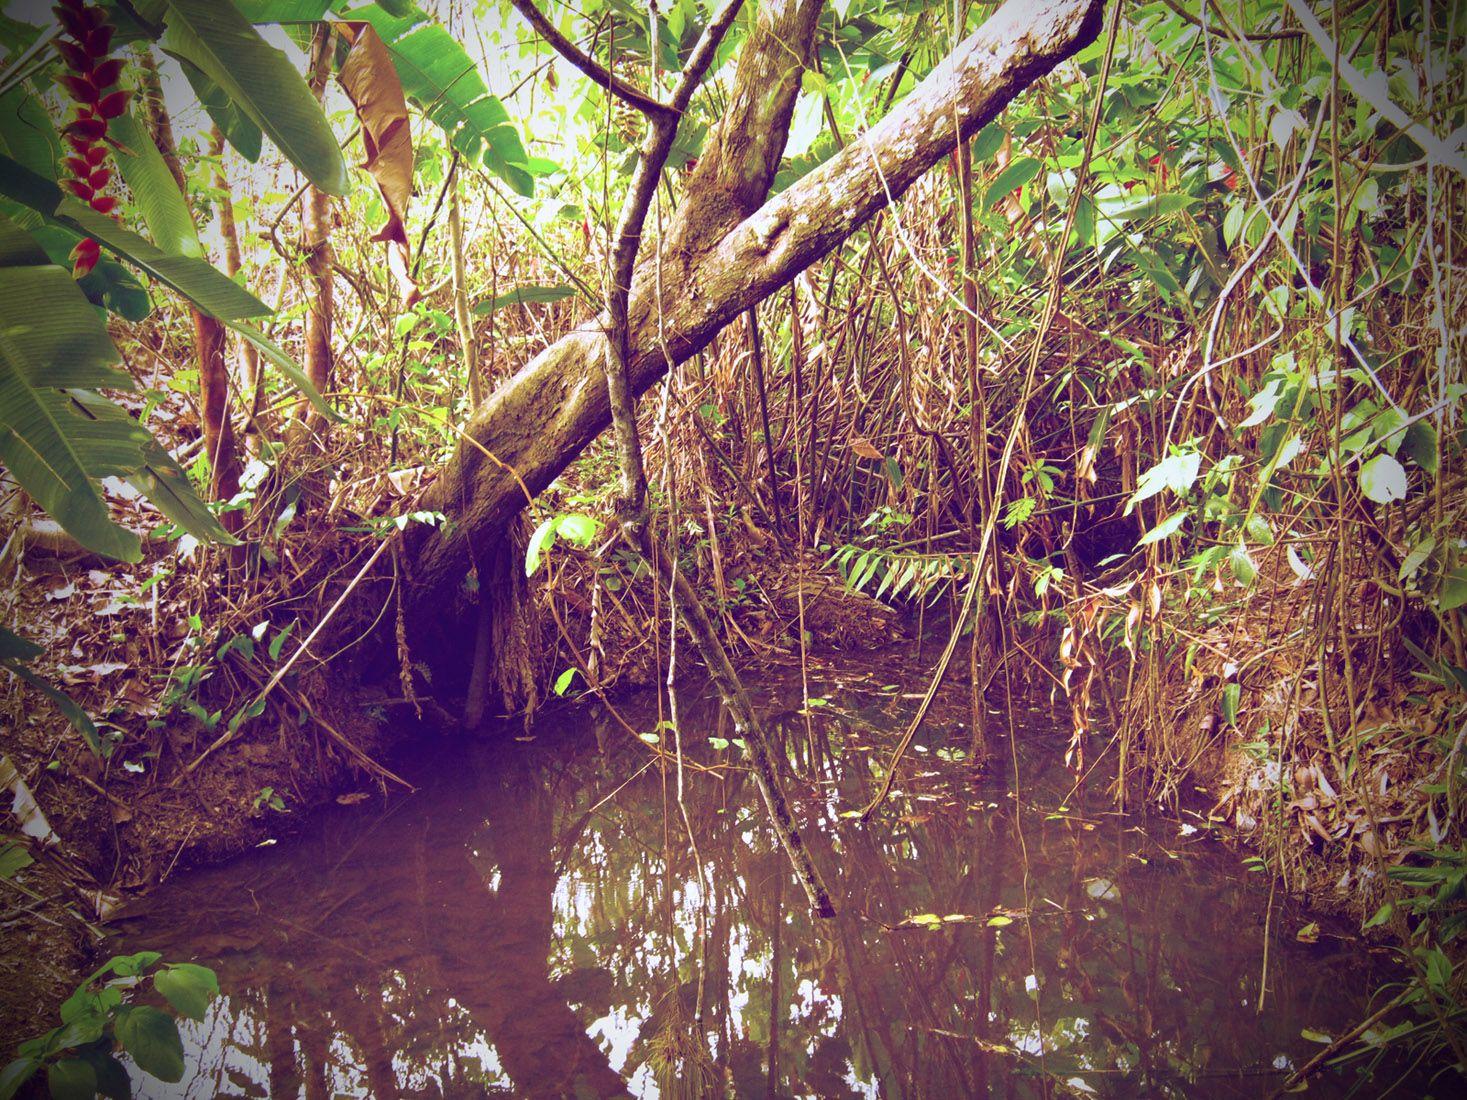 Centro de Experimentación Sostenible Onan Jonibo - permaculture in the peruvian amazon